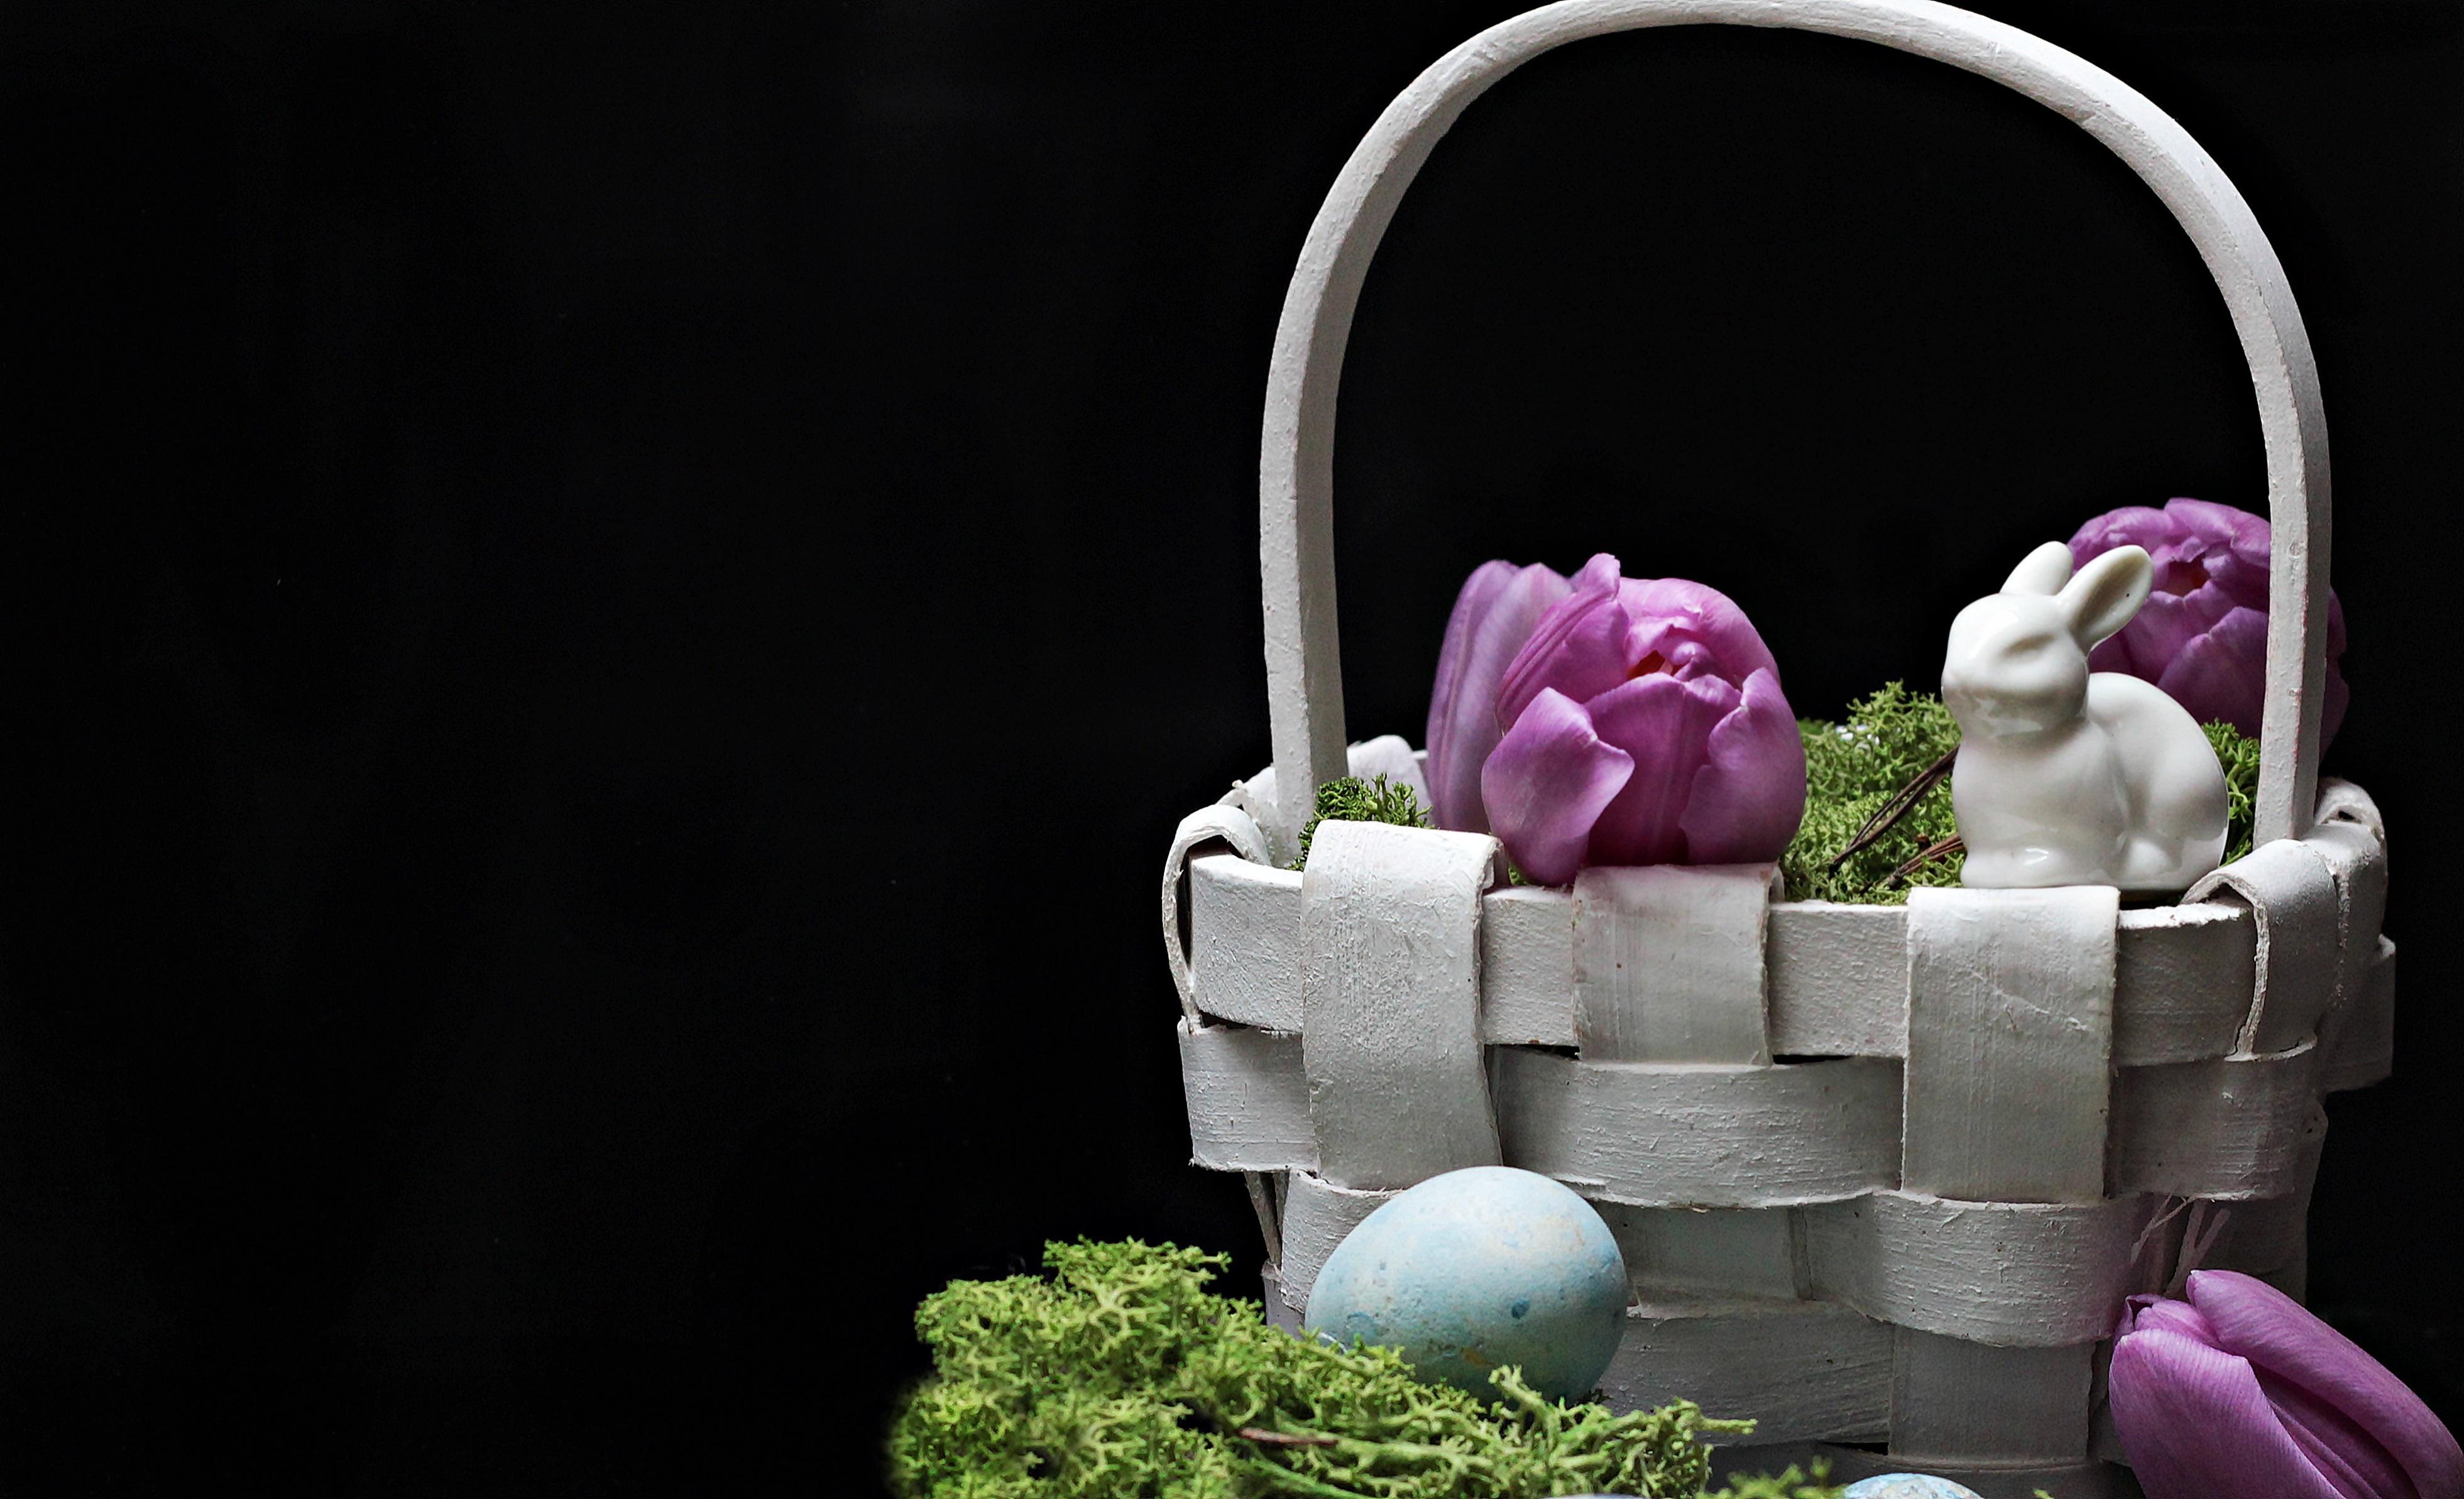 Free Images Plant Petal Moss Green Ceramic Basket Pink Map